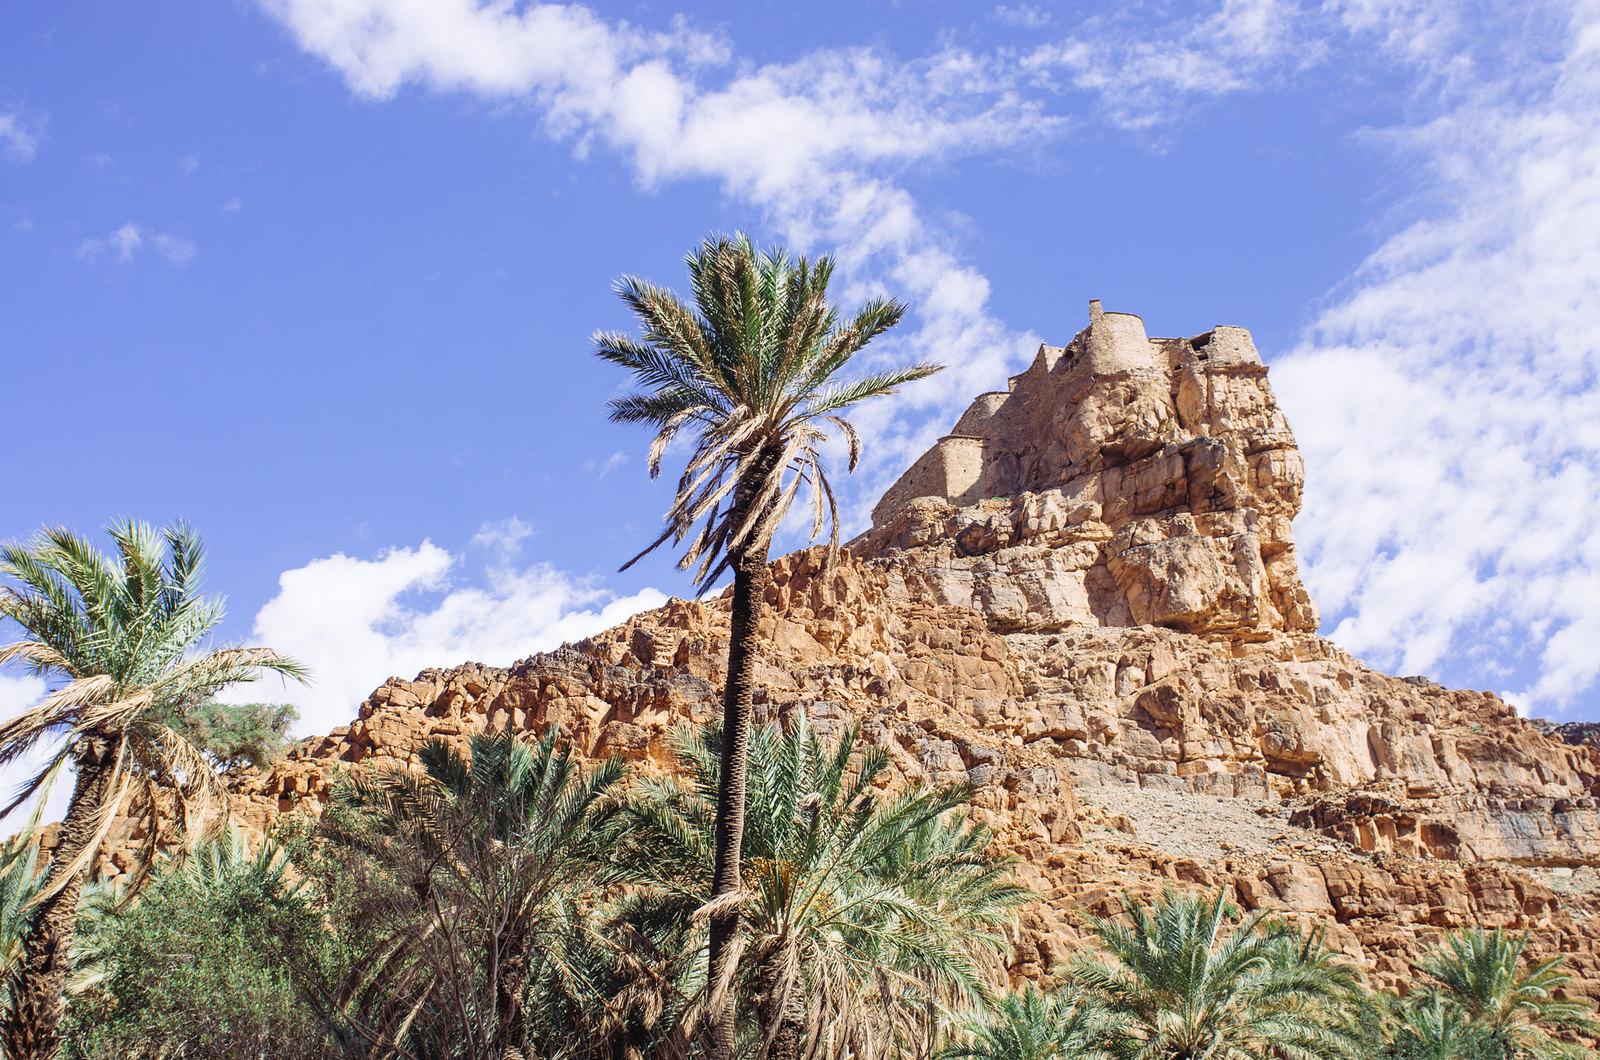 Amtoudi, anti-Atlas - 5 jours de trek au Maroc - L'agadir Id-Aïssa, grenier fortifié